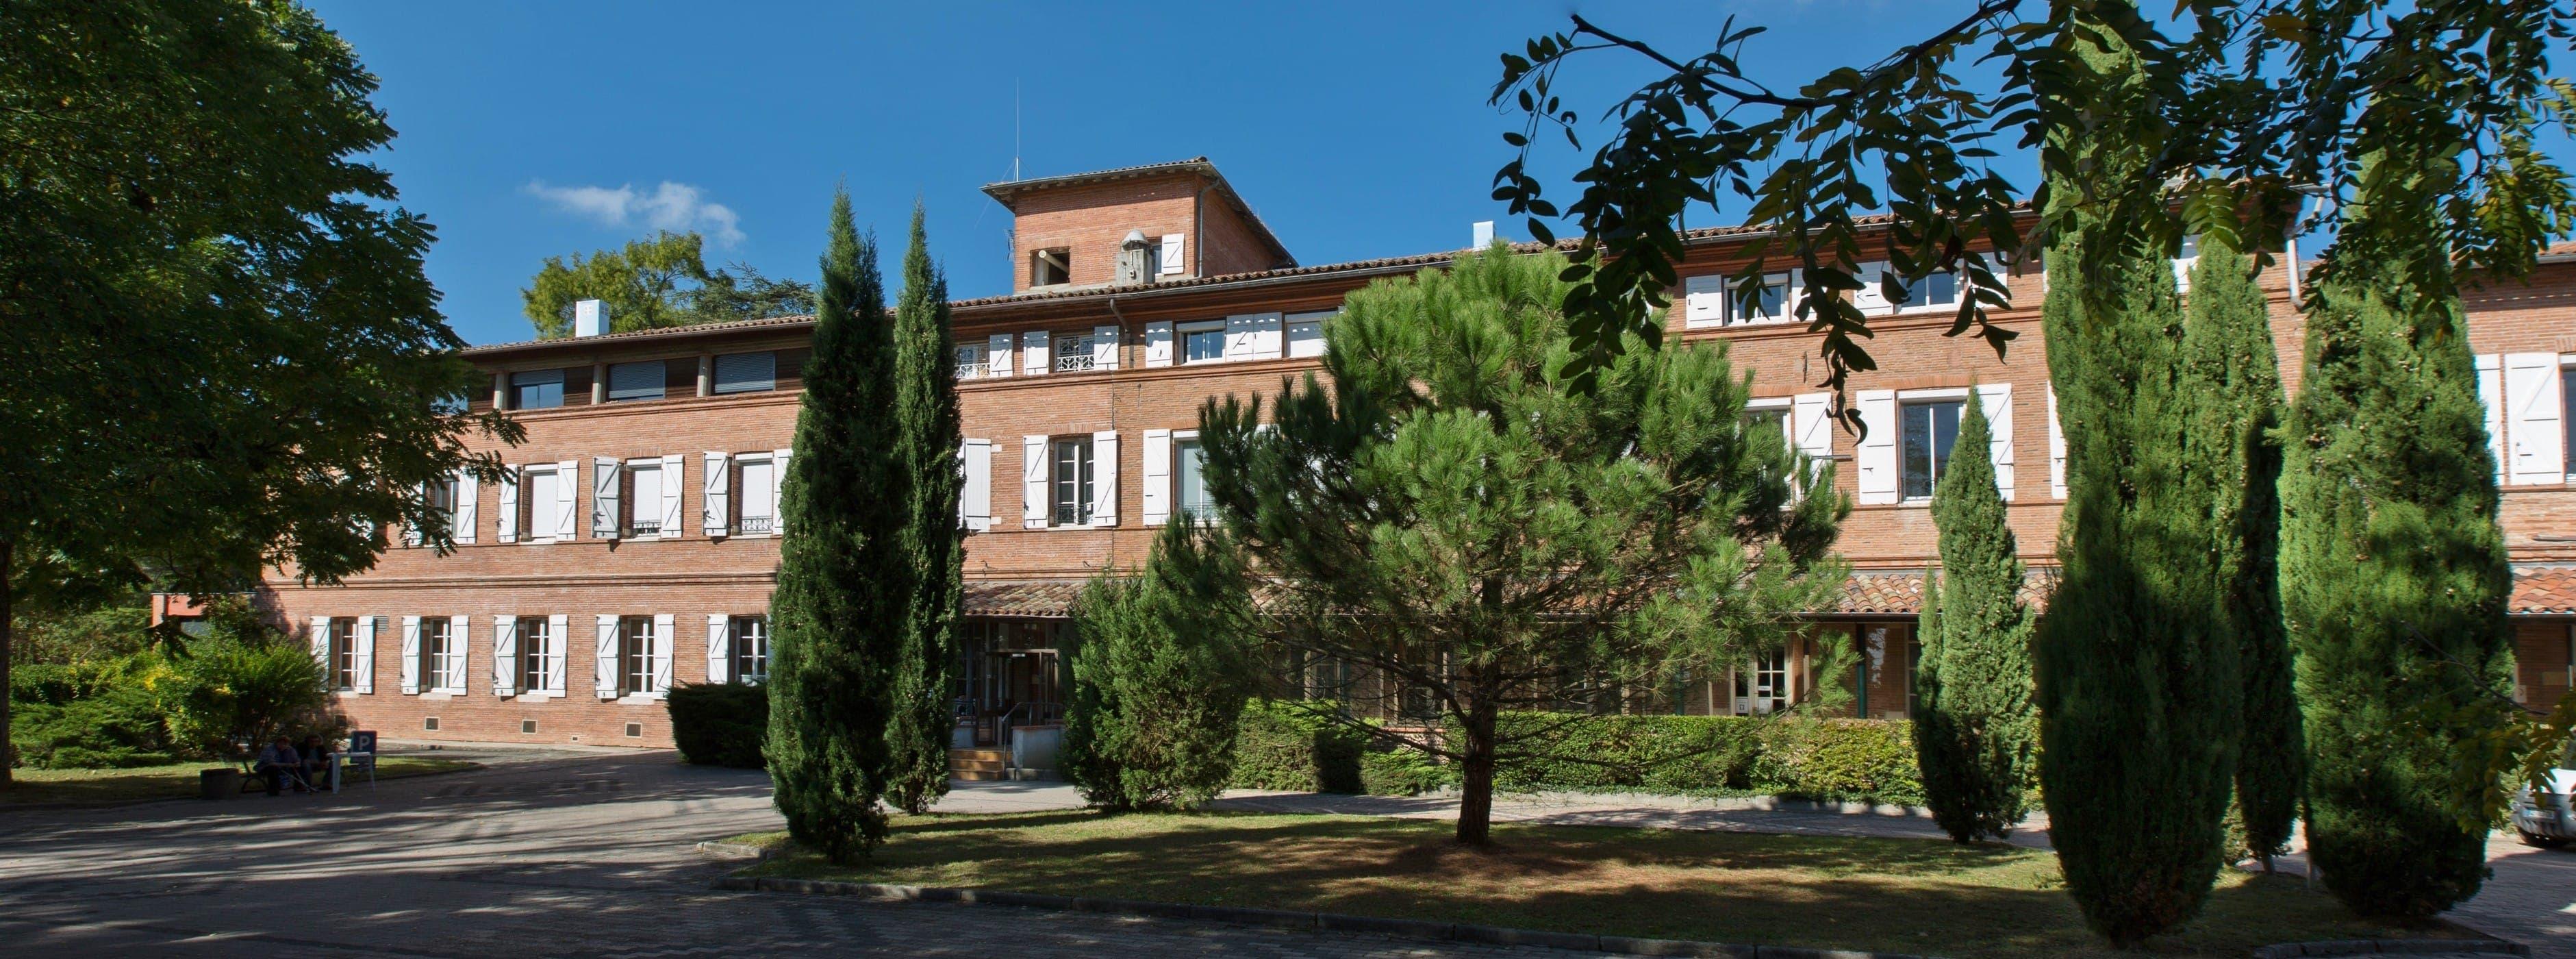 Clinique psychiatrique Marigny